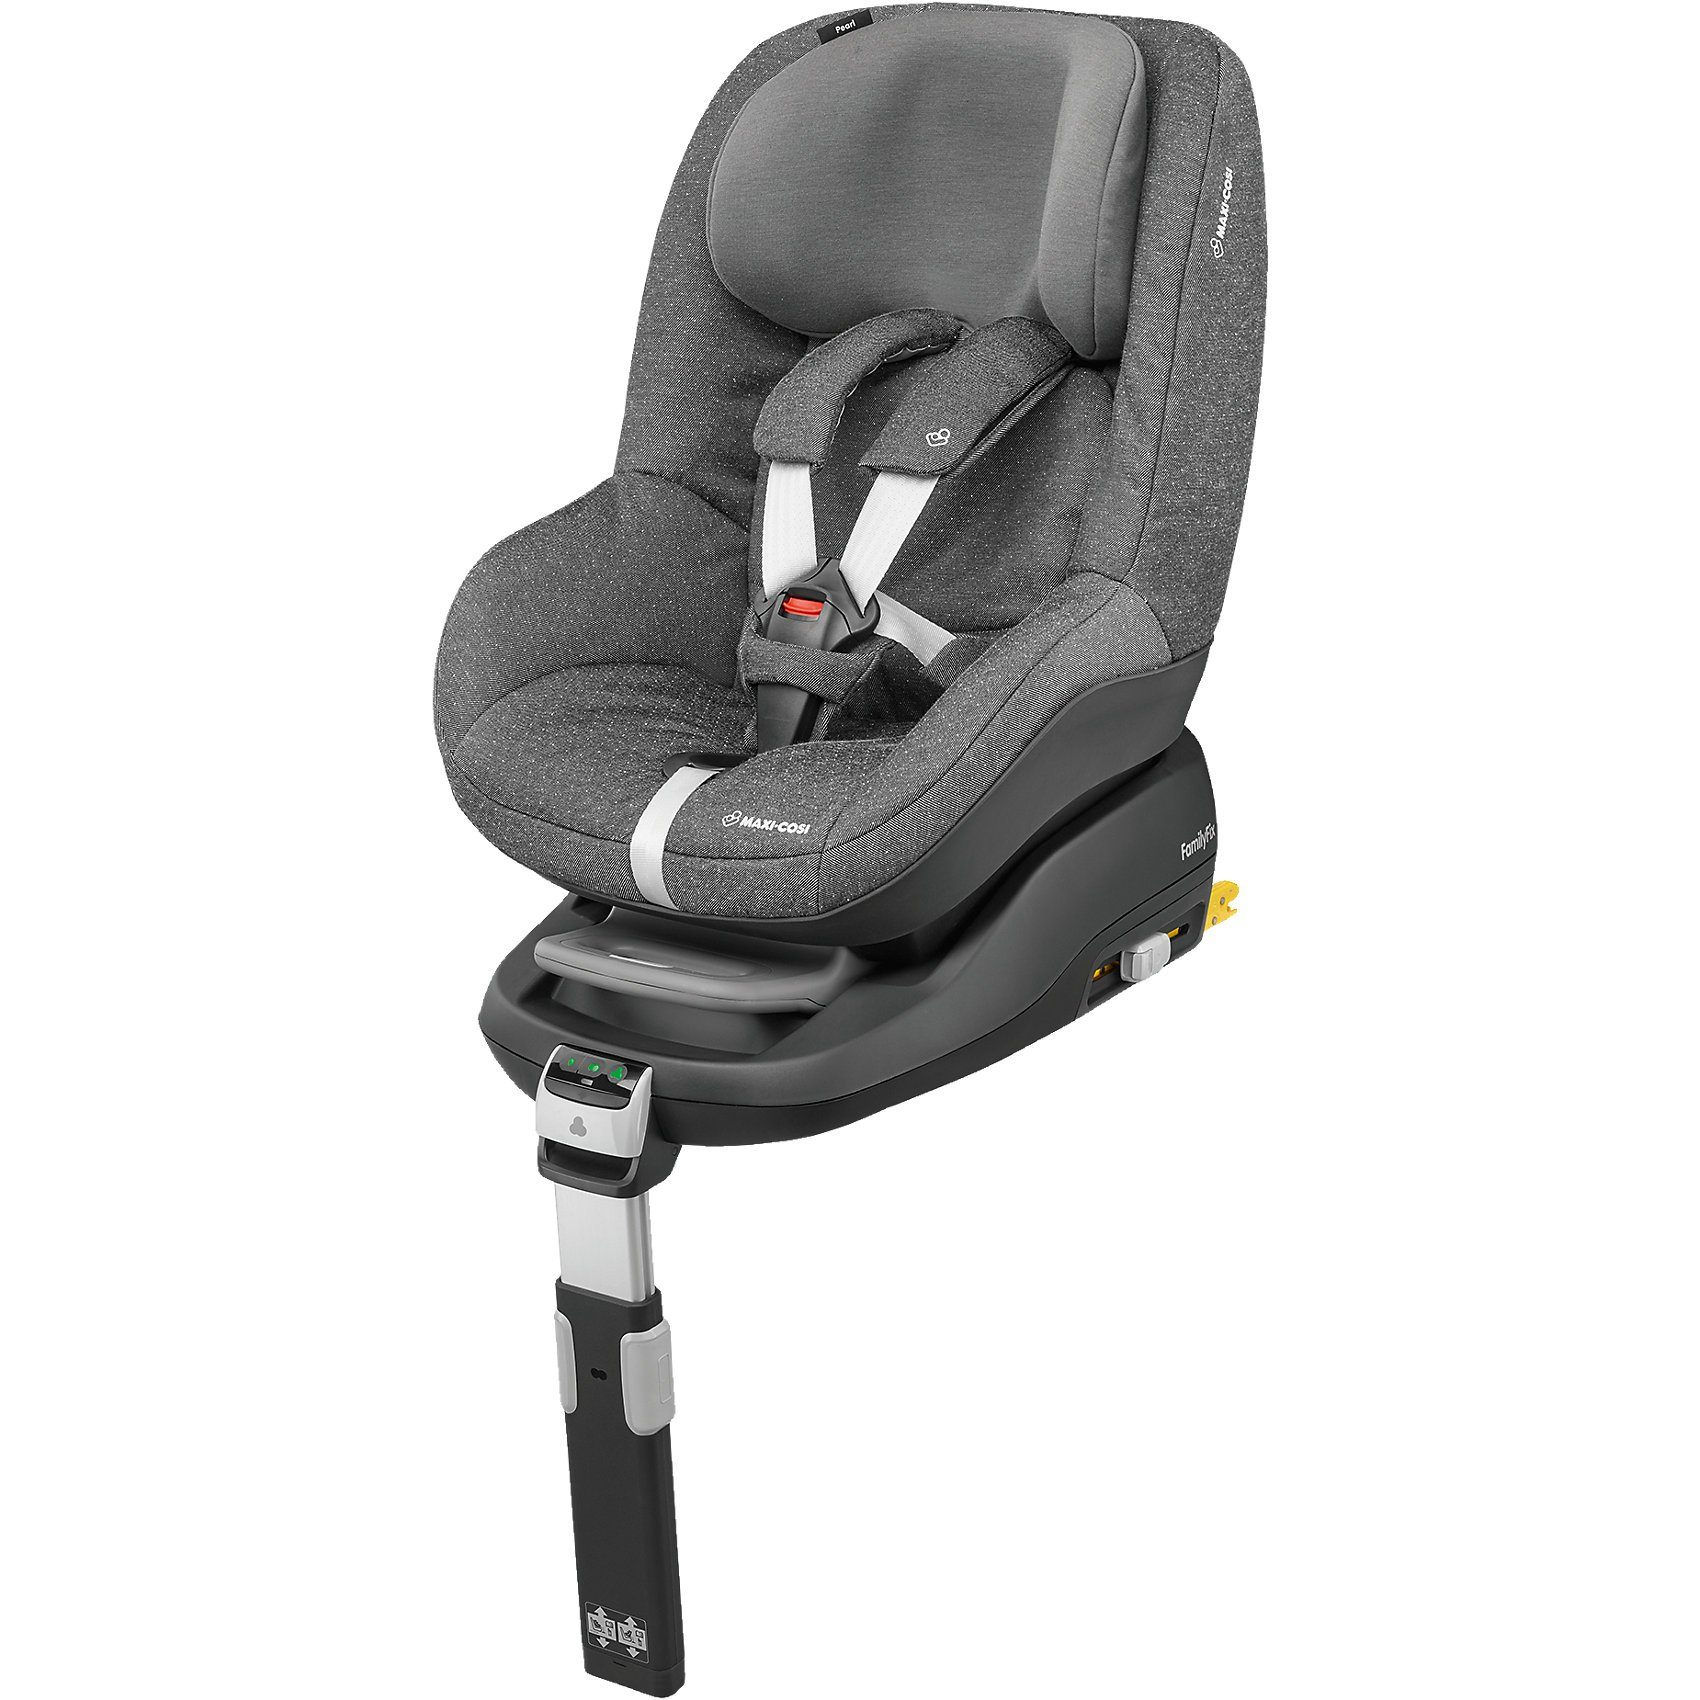 Maxi-Cosi Auto-Kindersitz Pearl, Sparkling Grey, 2018